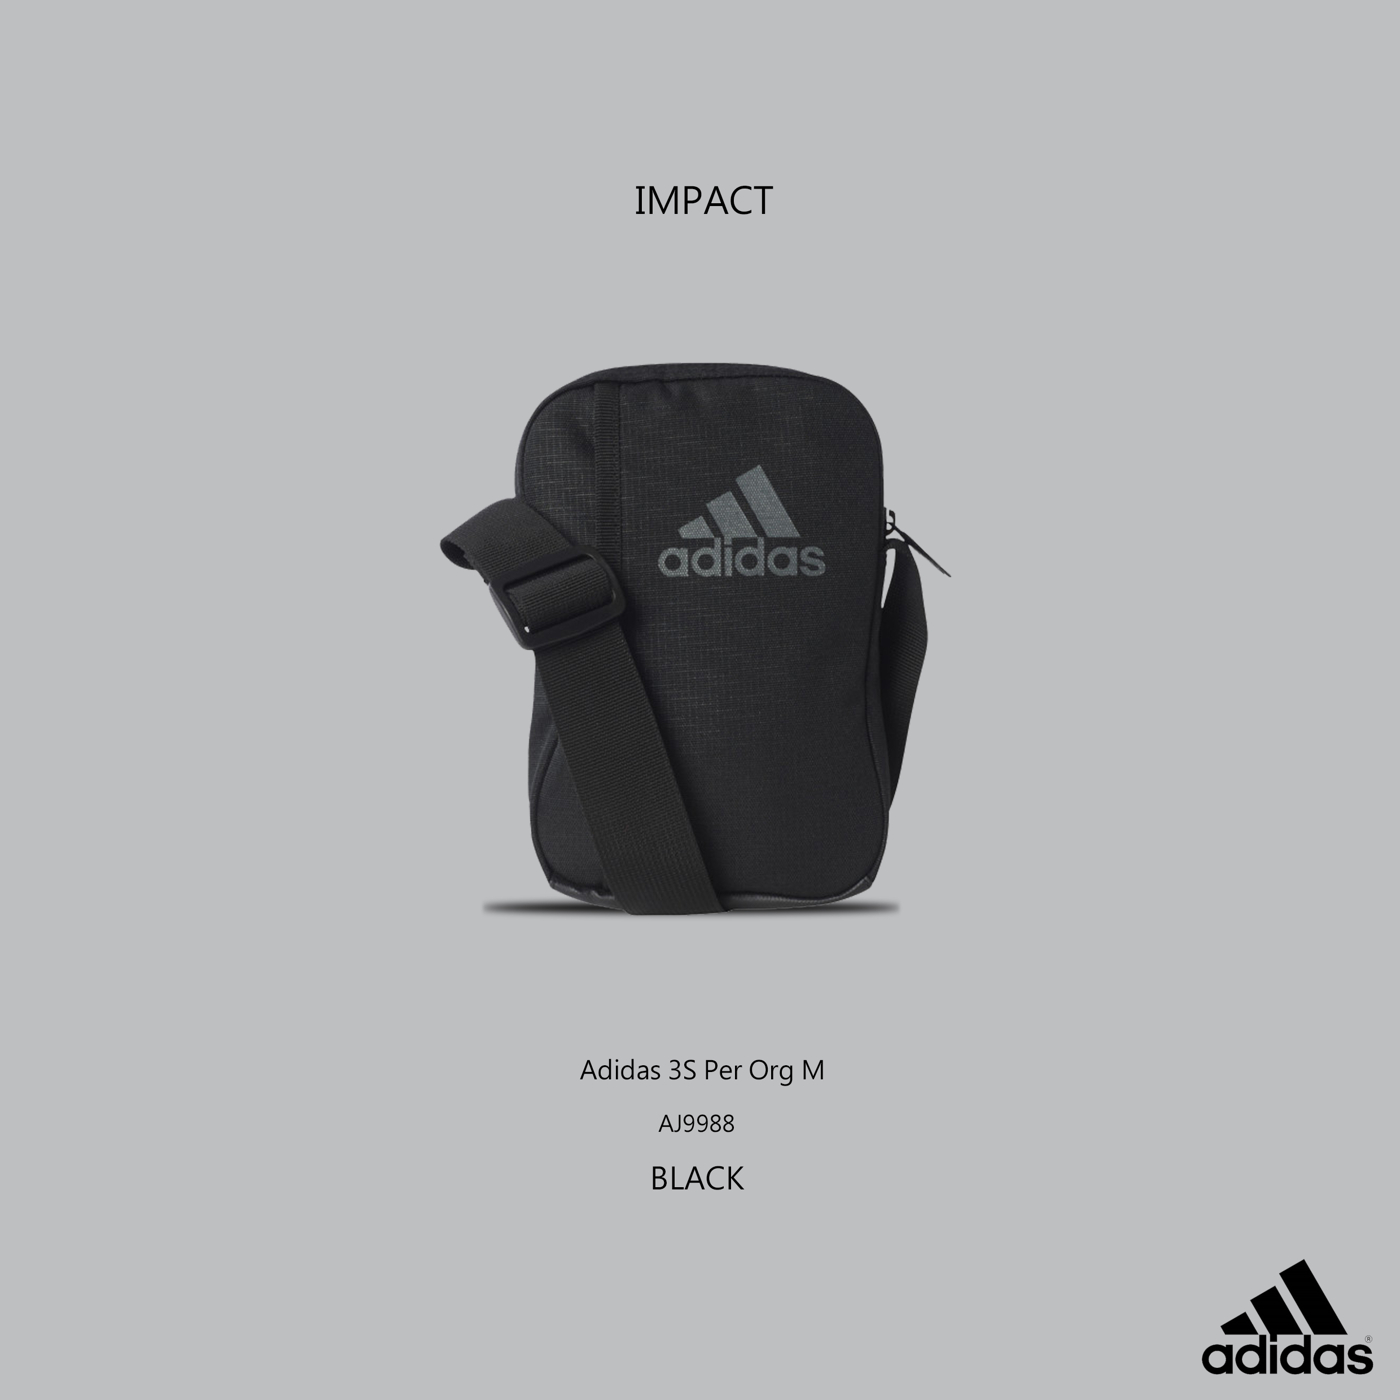 IMPACT Adidas 3S Per Org M LOGO 三線 小側背包 黑 超實用 男女 休閒 運動 百搭 AJ9988